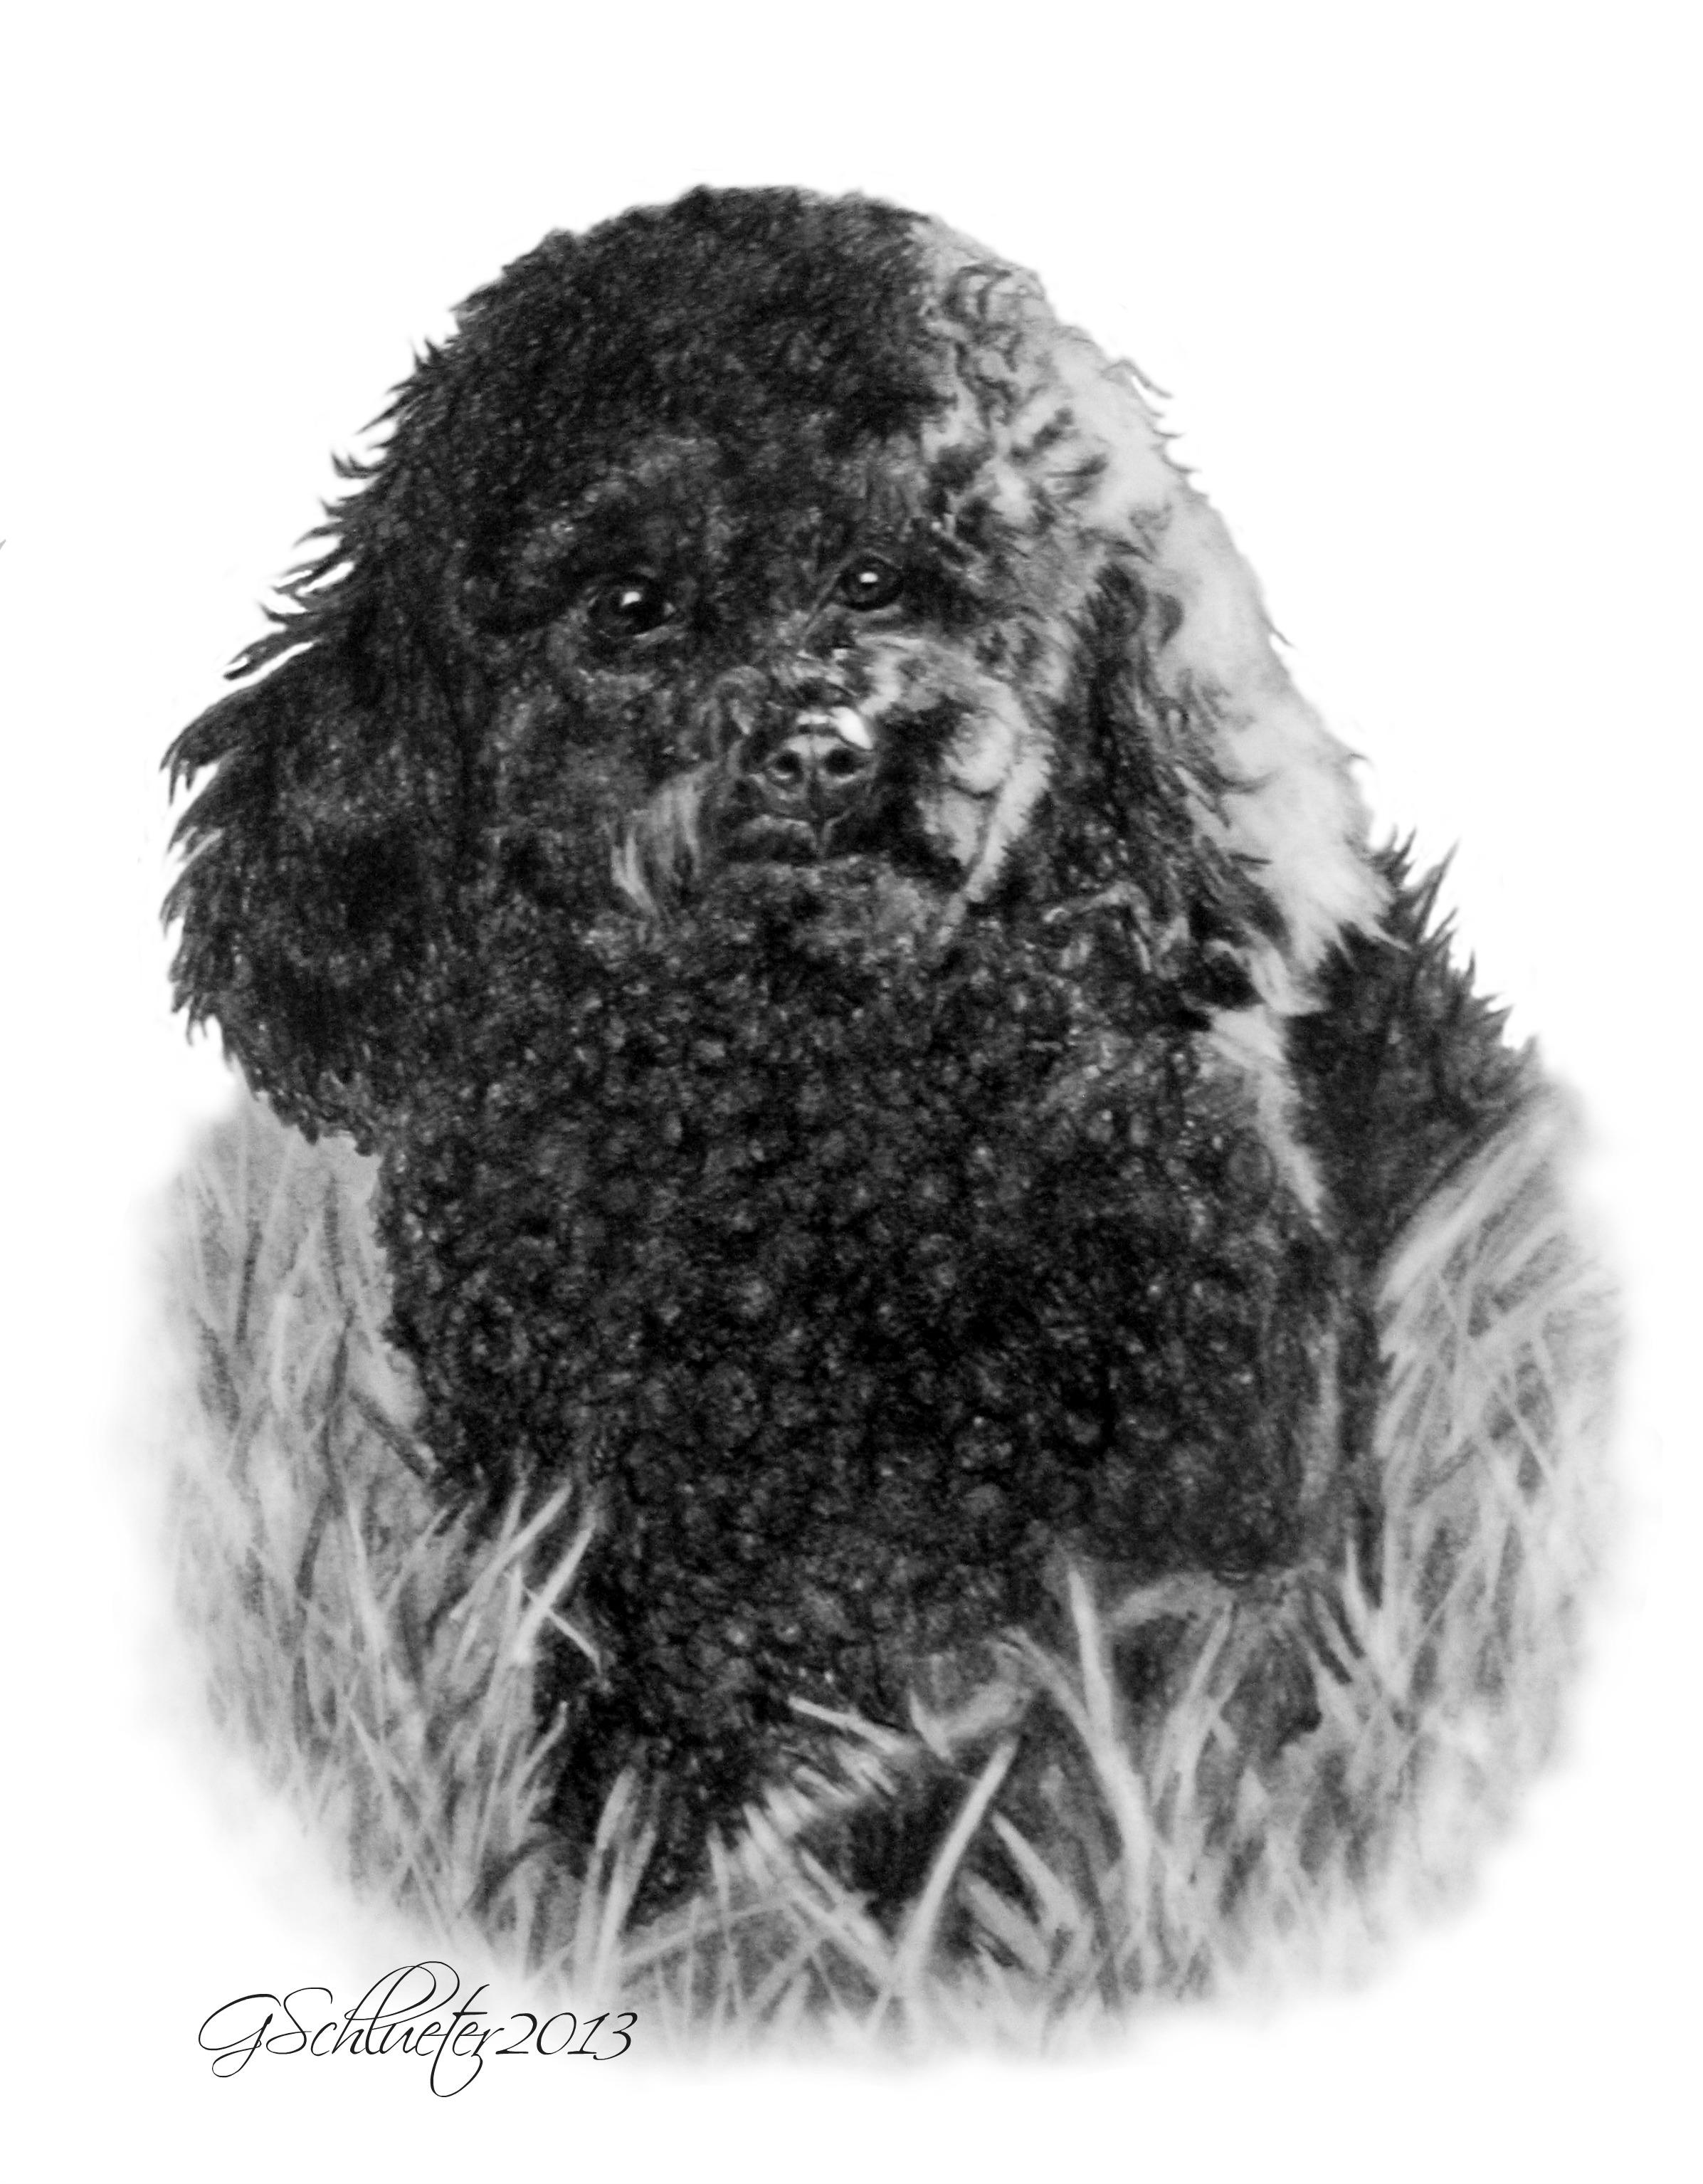 Drawn poodle water Genevieve #Poodle Drawn sketch